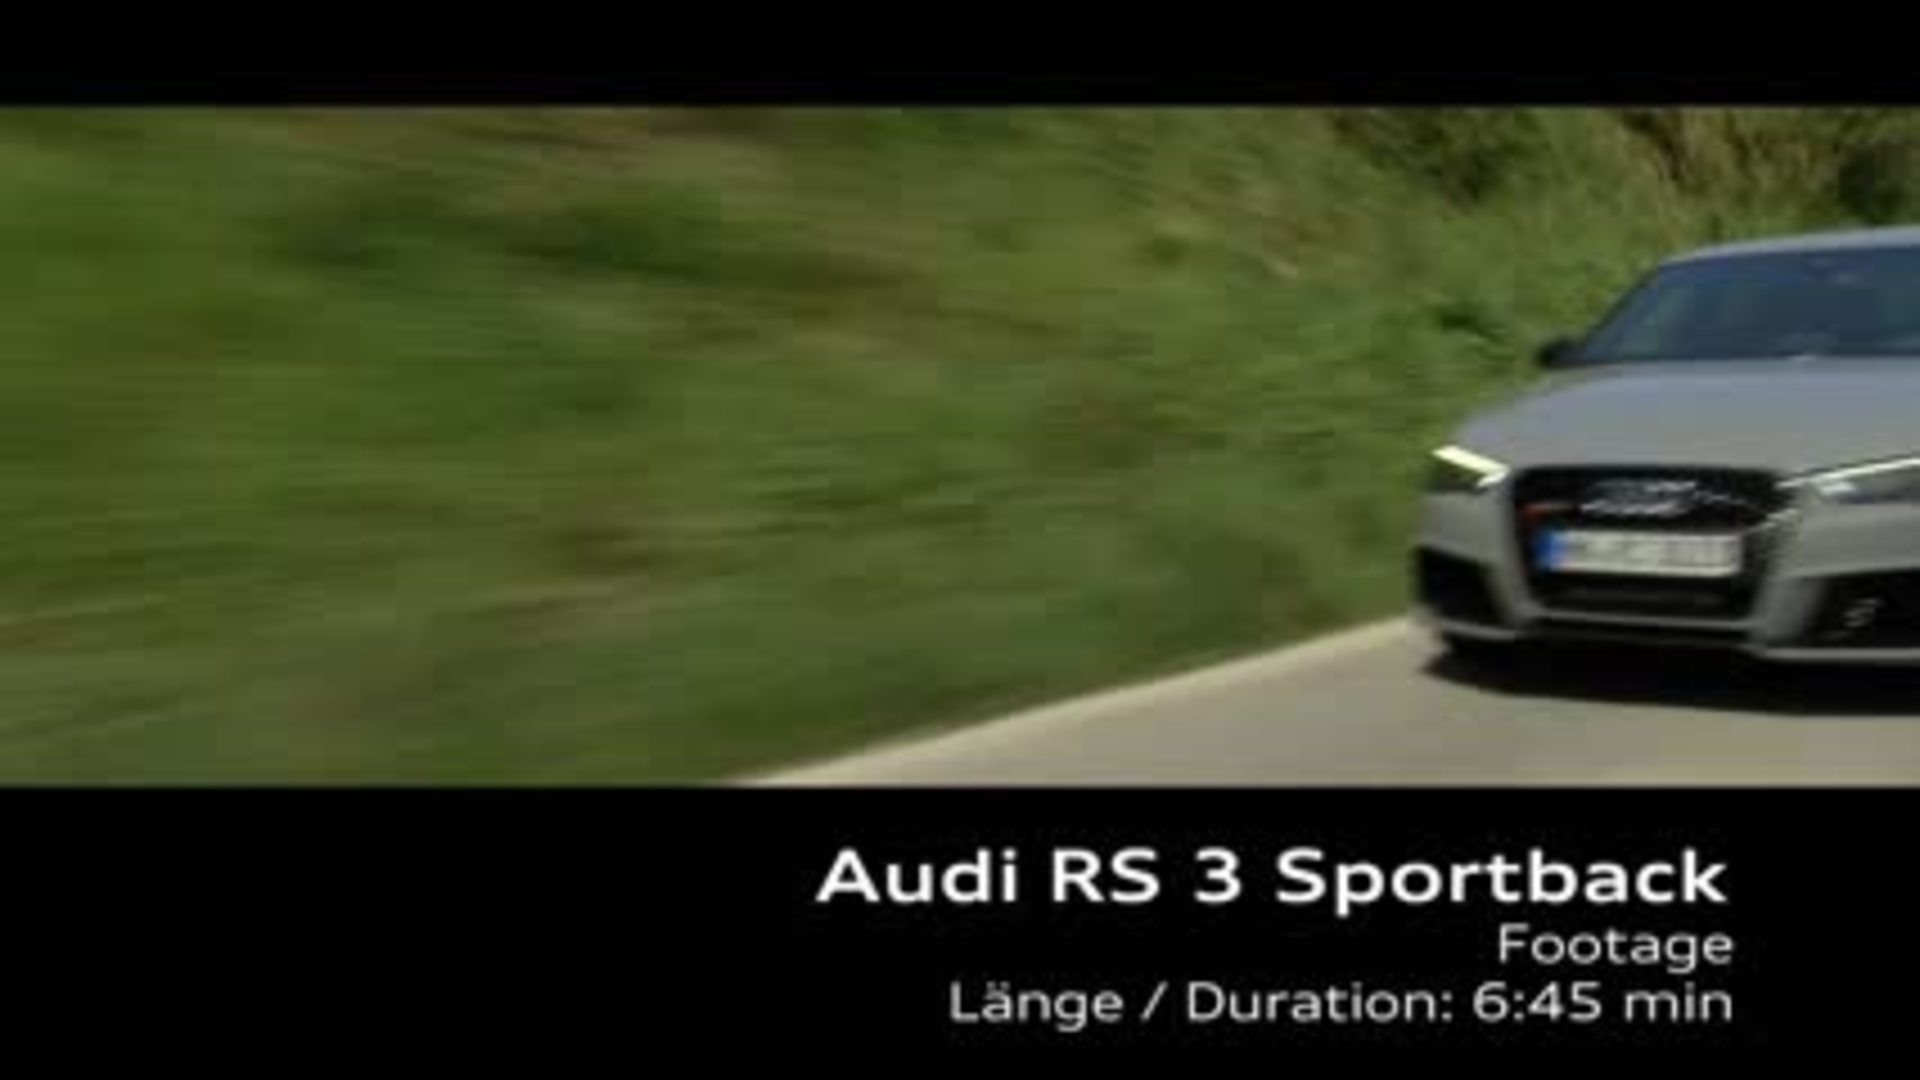 Der neue Audi RS 3 Sportback - Footage Frühling